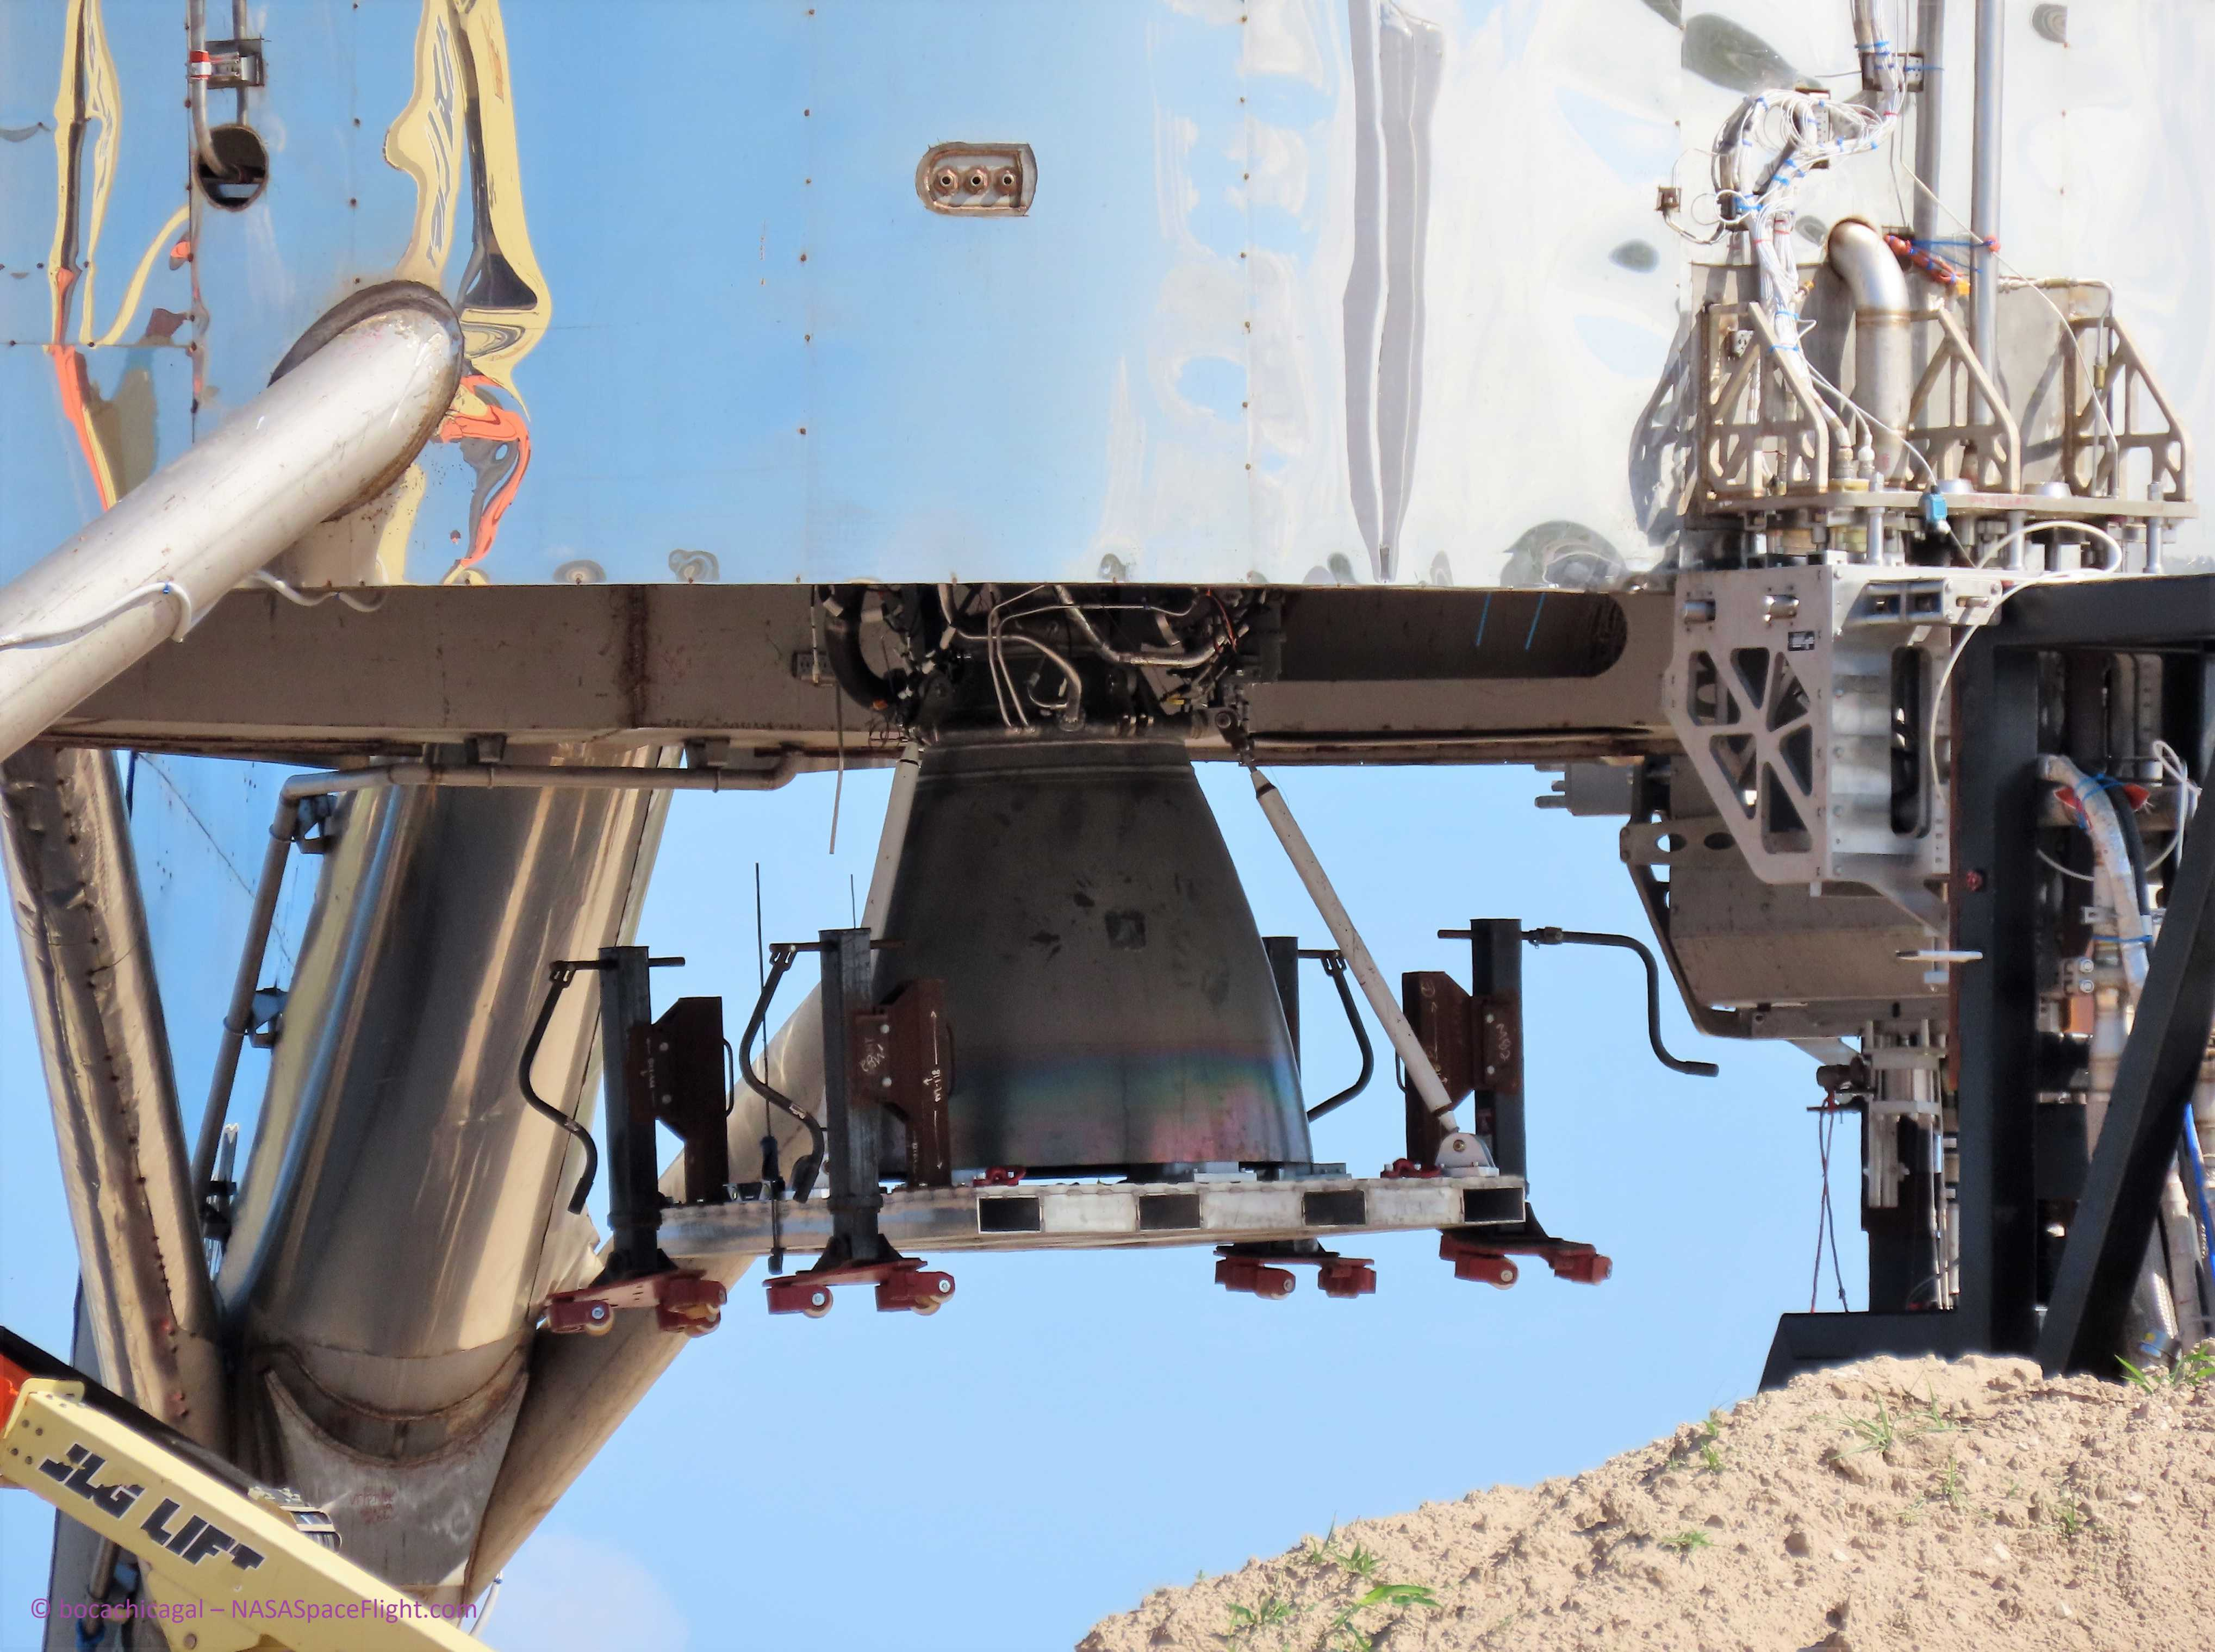 Boca Chica Starhopper Raptor SN04 installation 060219 (NASASpaceflight – bocachicagal) 3 (c)